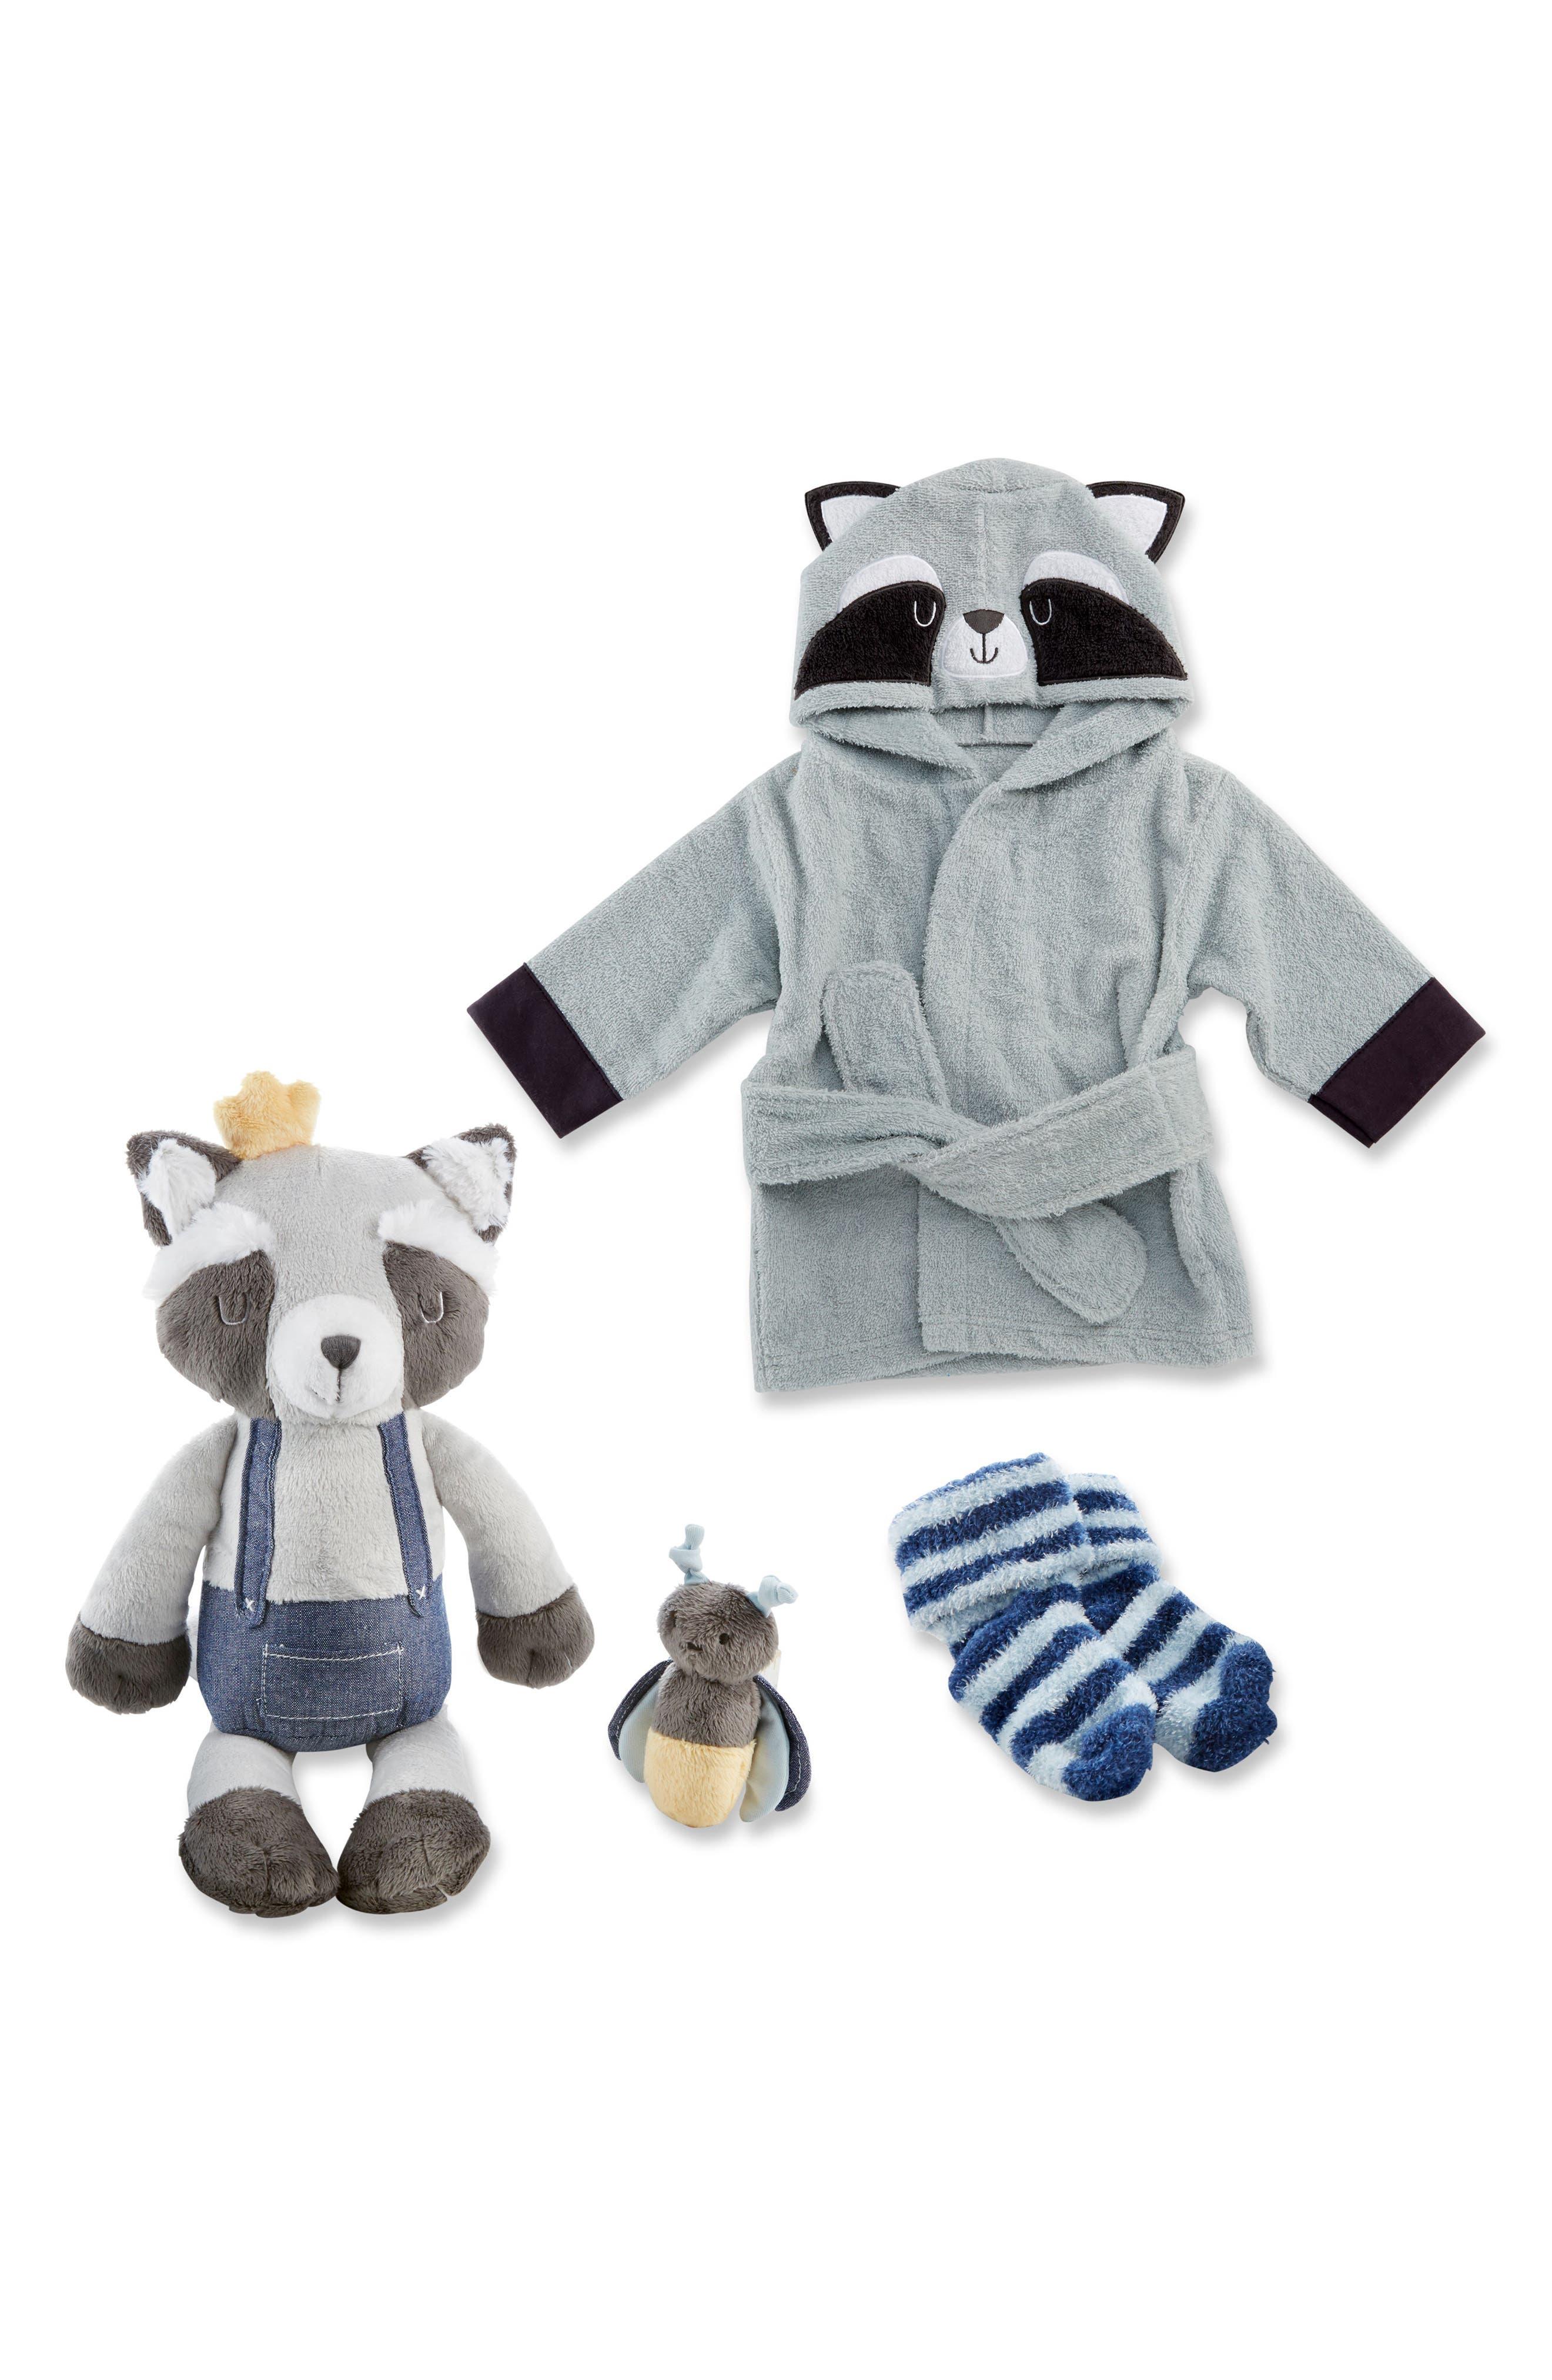 Main Image - Baby Aspen Forest Friends Raccoon Plush Robe, Fuzzy Socks, Stuffed Animal & Rattle Set (Baby)